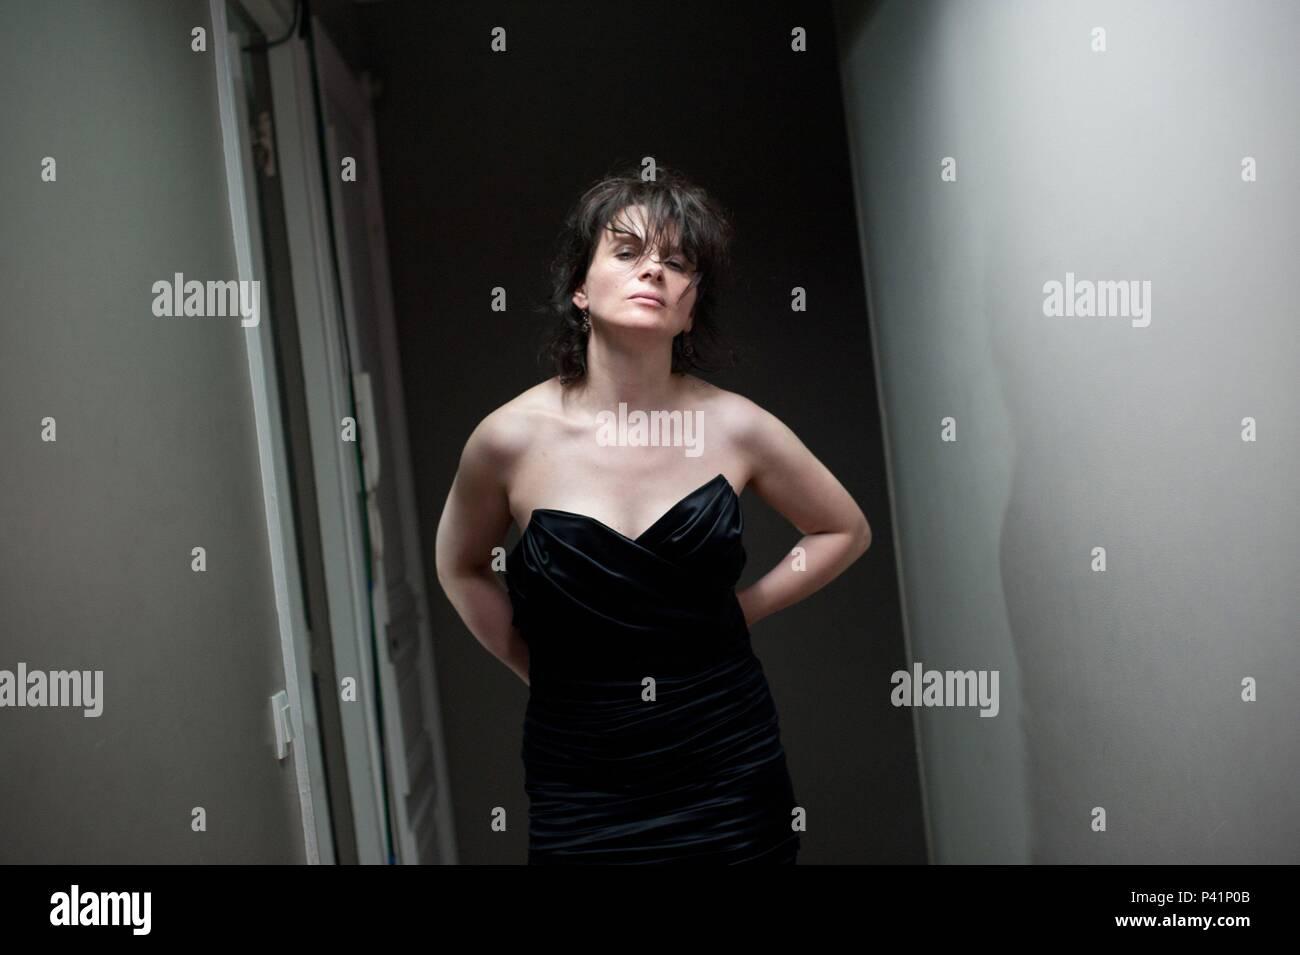 Lisa Jackson (model) photo